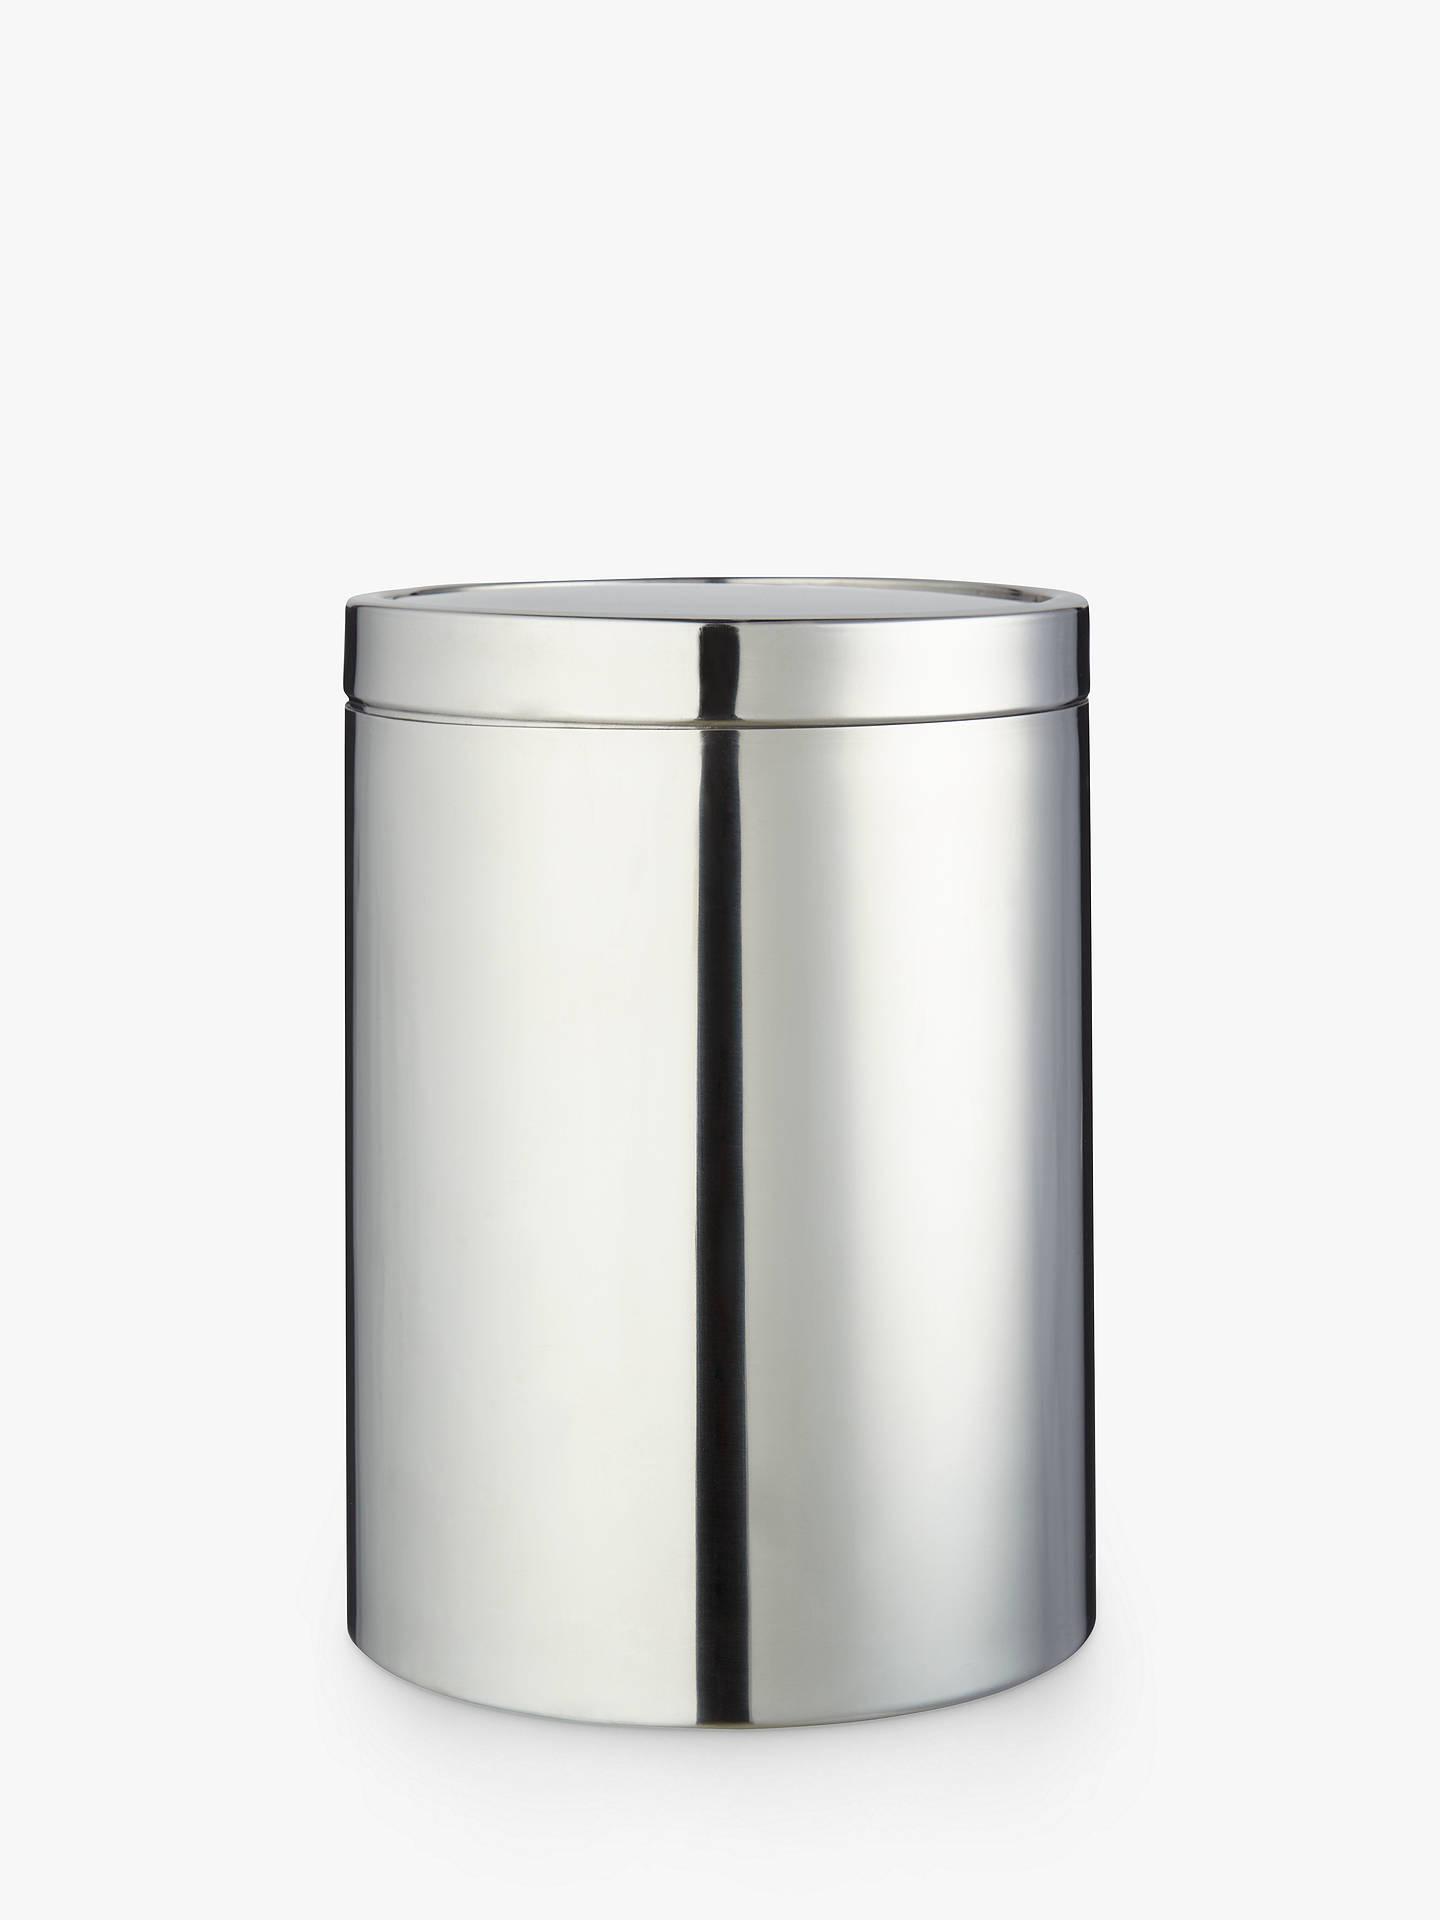 john lewis partners stainless steel swing bathroom bin. Black Bedroom Furniture Sets. Home Design Ideas